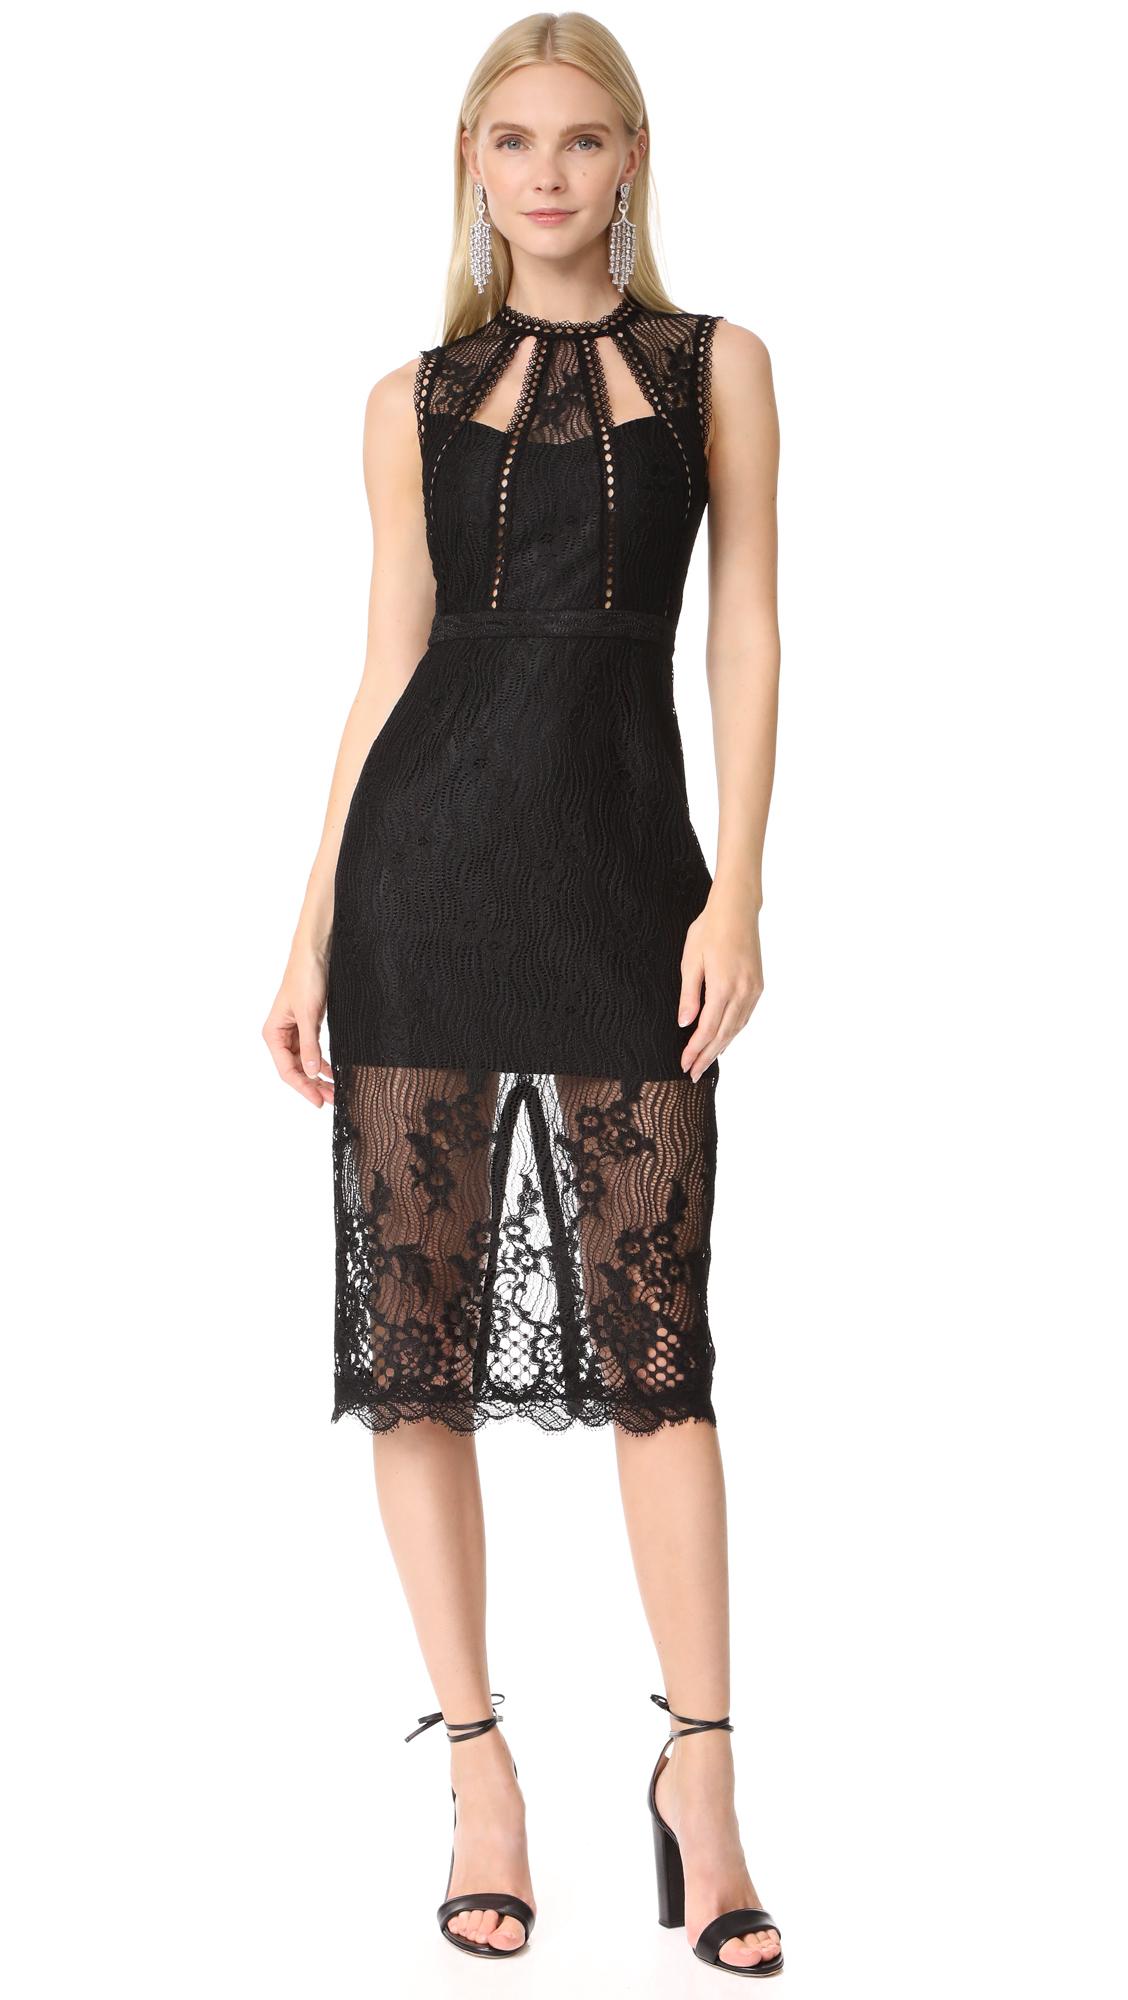 Alexis Oralie Dress - Black